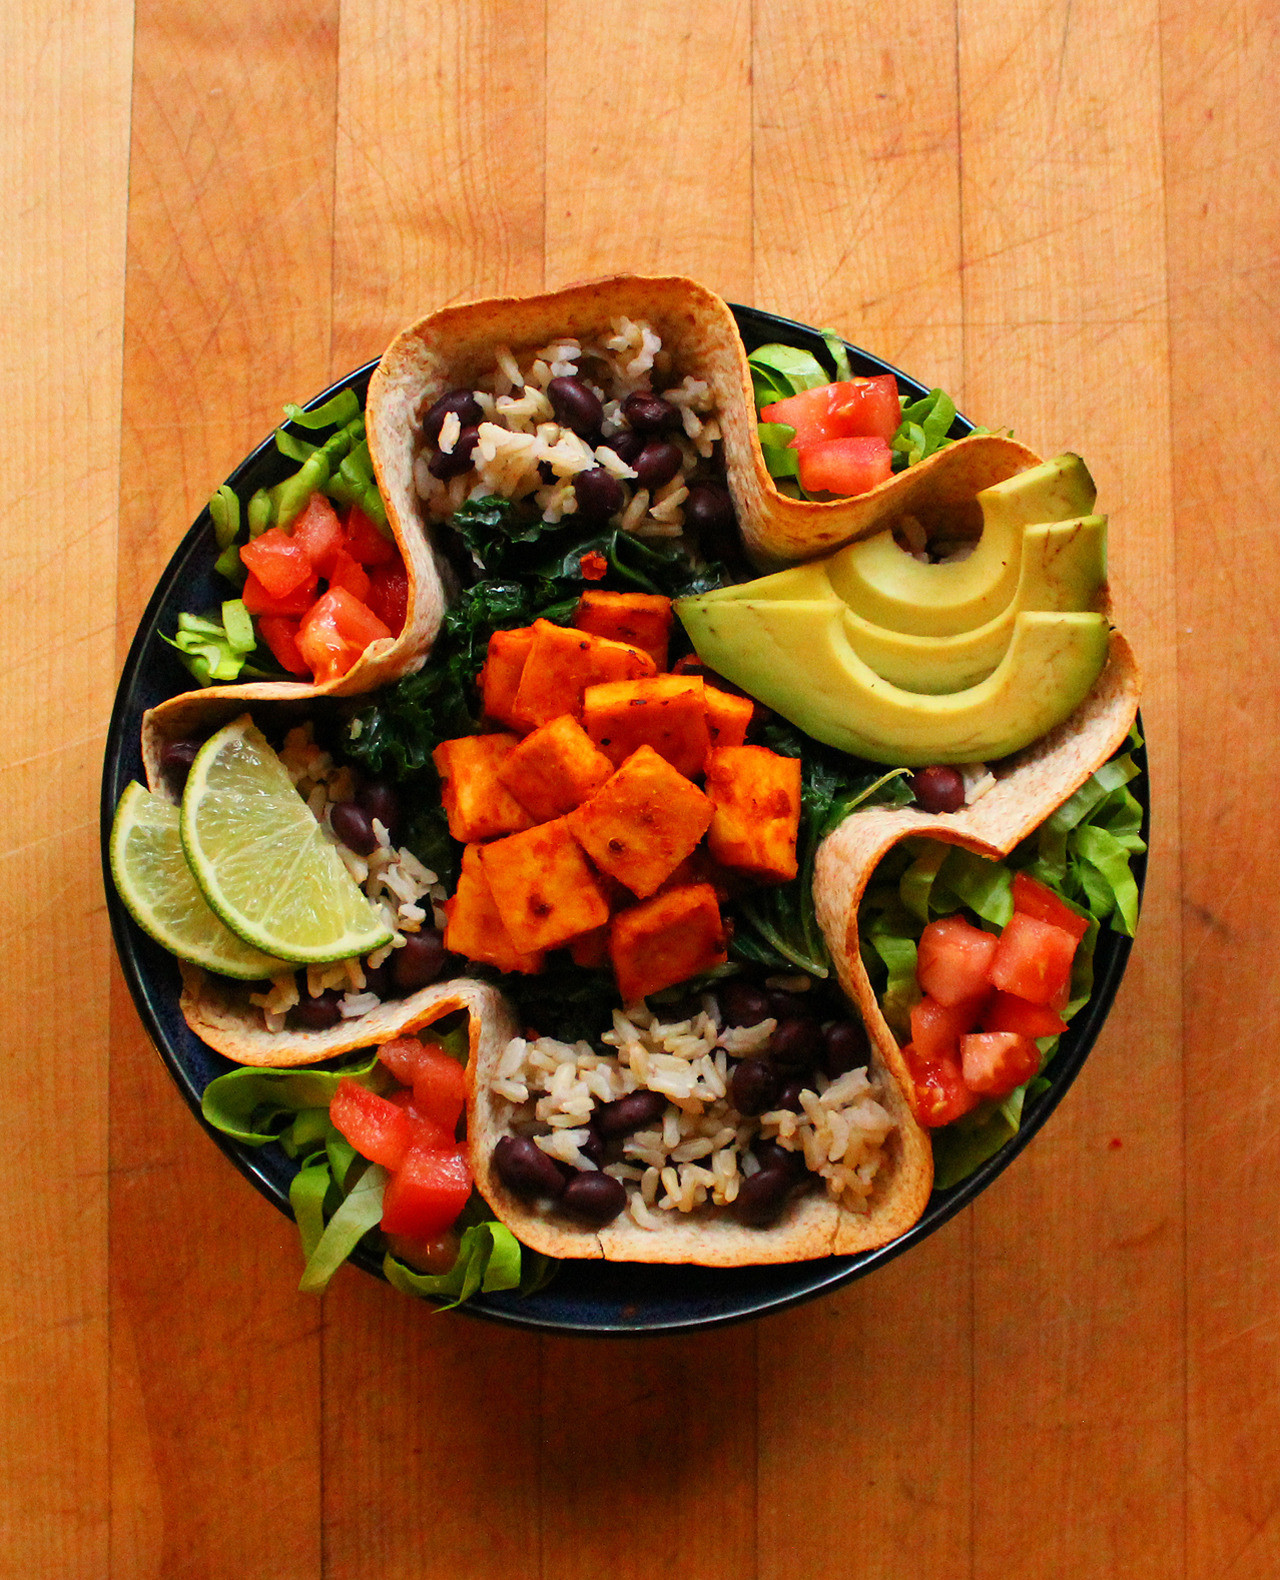 Vegetarian Recipes Tumblr  westsoy We've partnered with Garden of Vegan